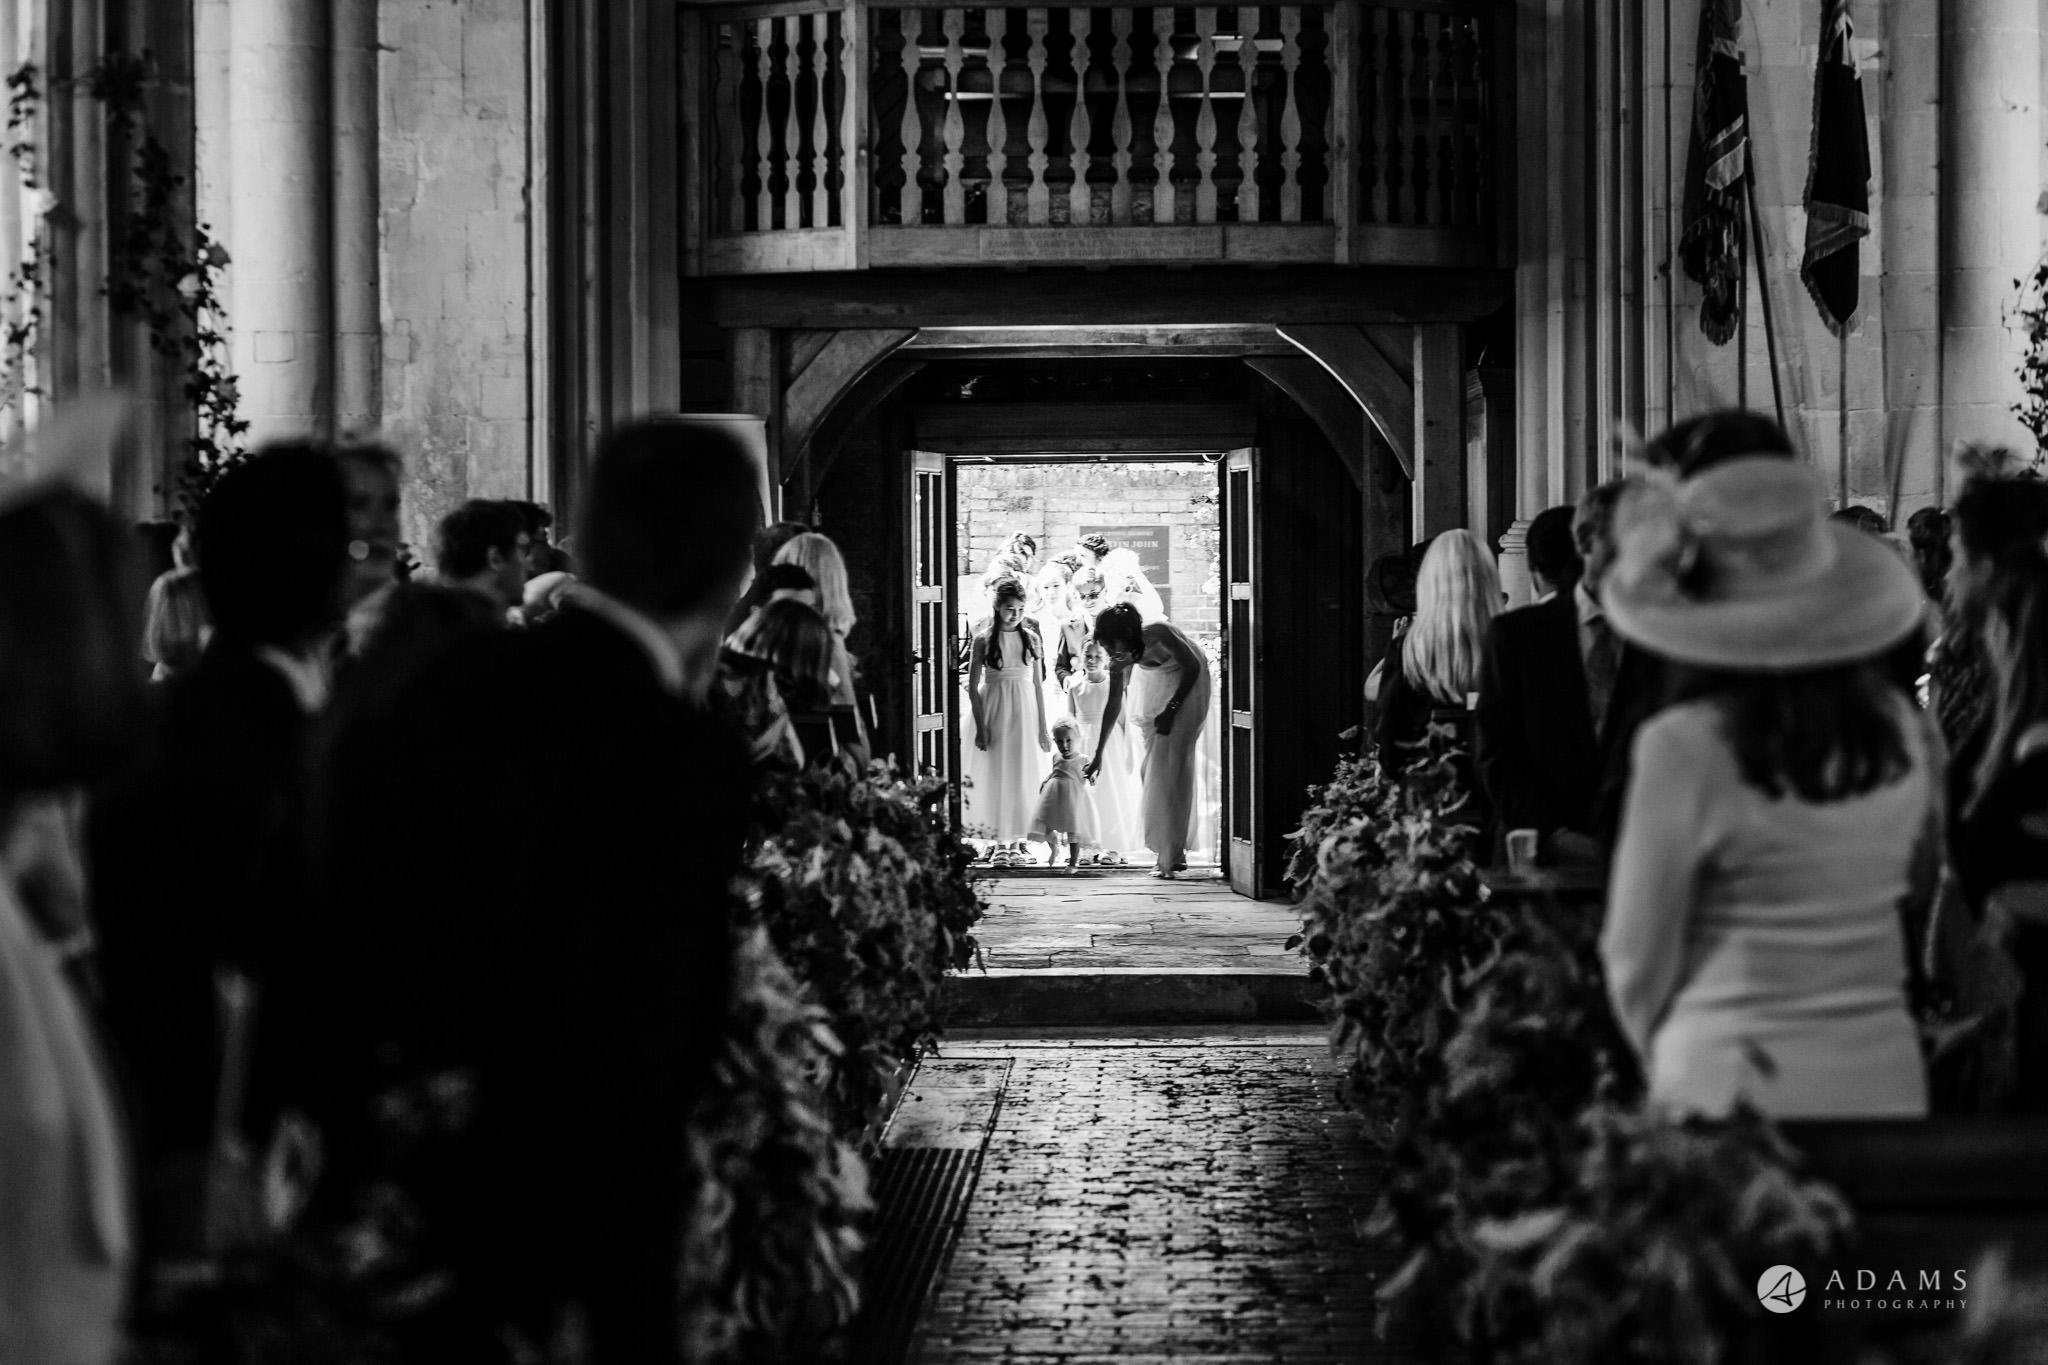 Trinity College Cambridge wedding flower girl enters the church